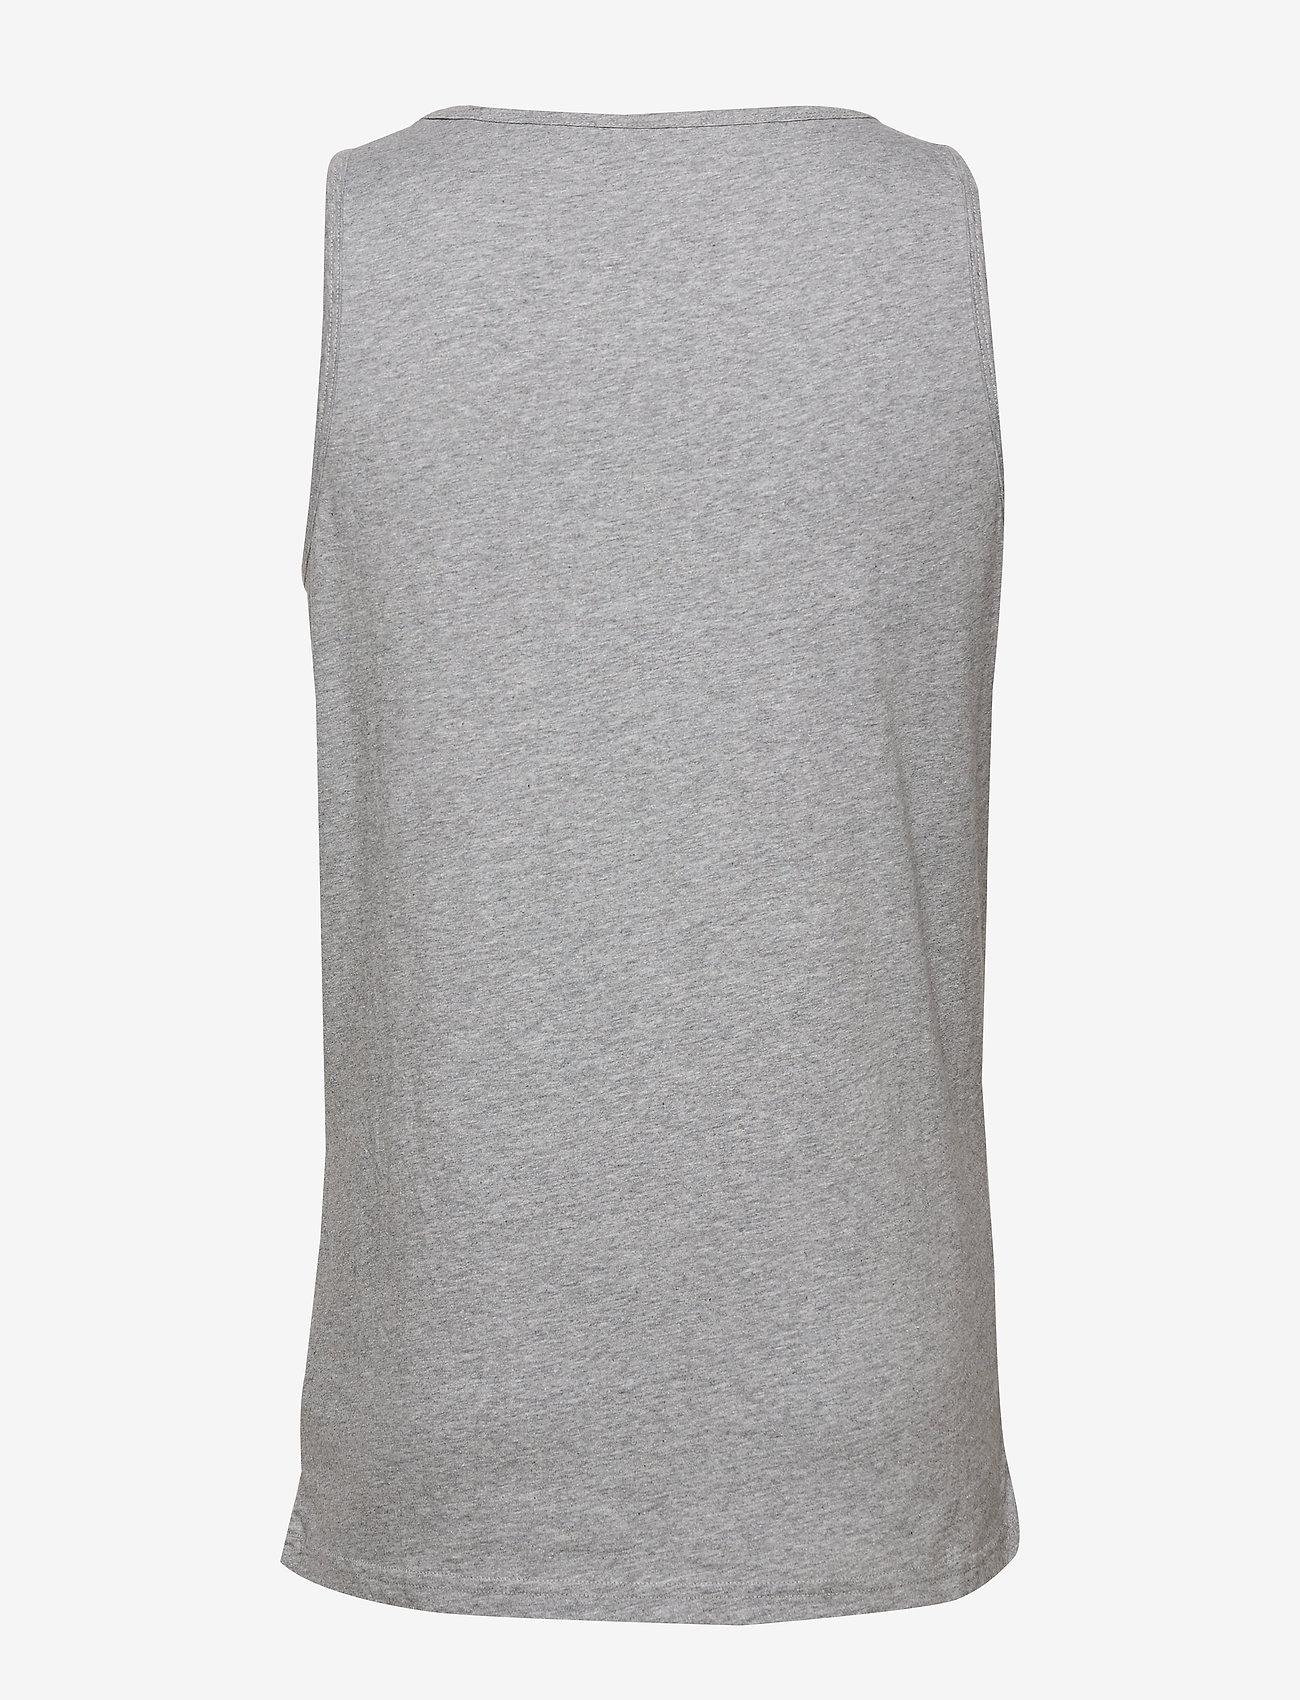 Knowledge Cotton Apparel PALM owl chest tank top - GOTS/Vega - T-skjorter GREY MELANGE - Menn Klær